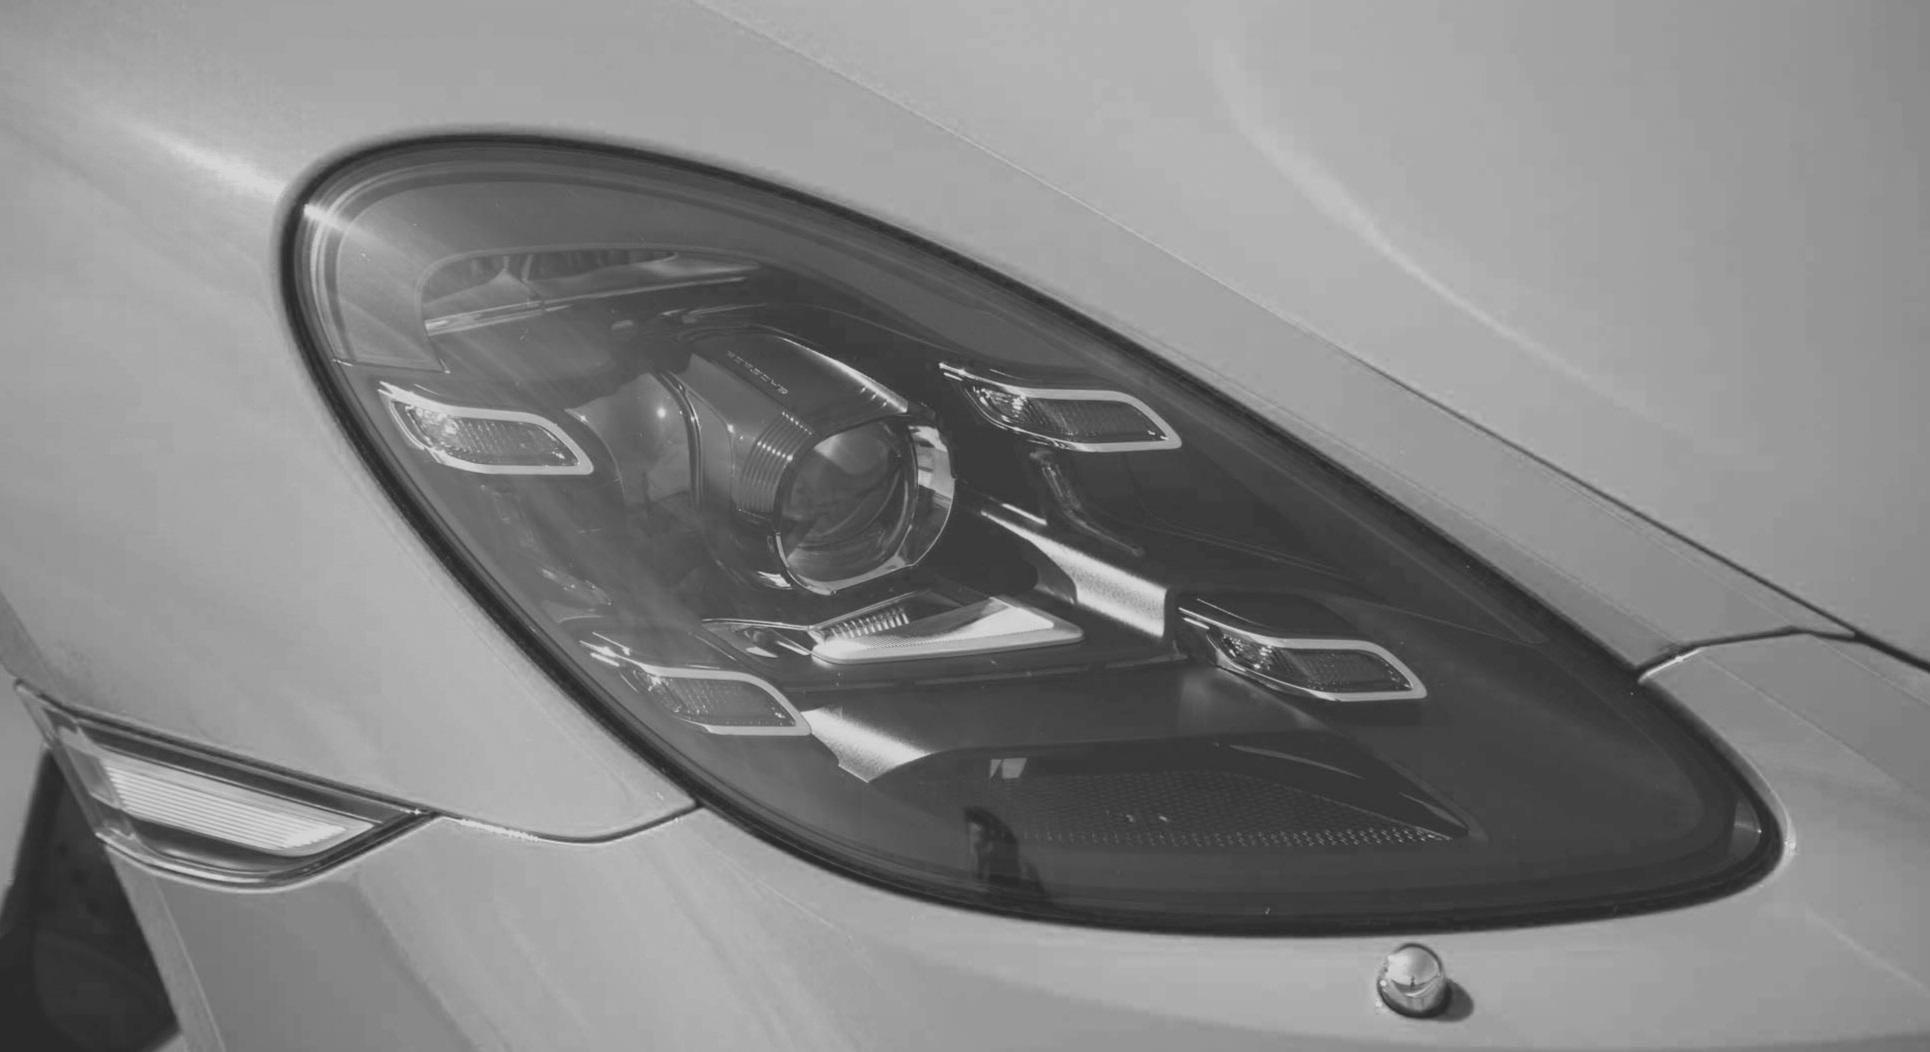 Porsche Cayman - 2015 CAYMAN GT4 COUPE£XX, XXX